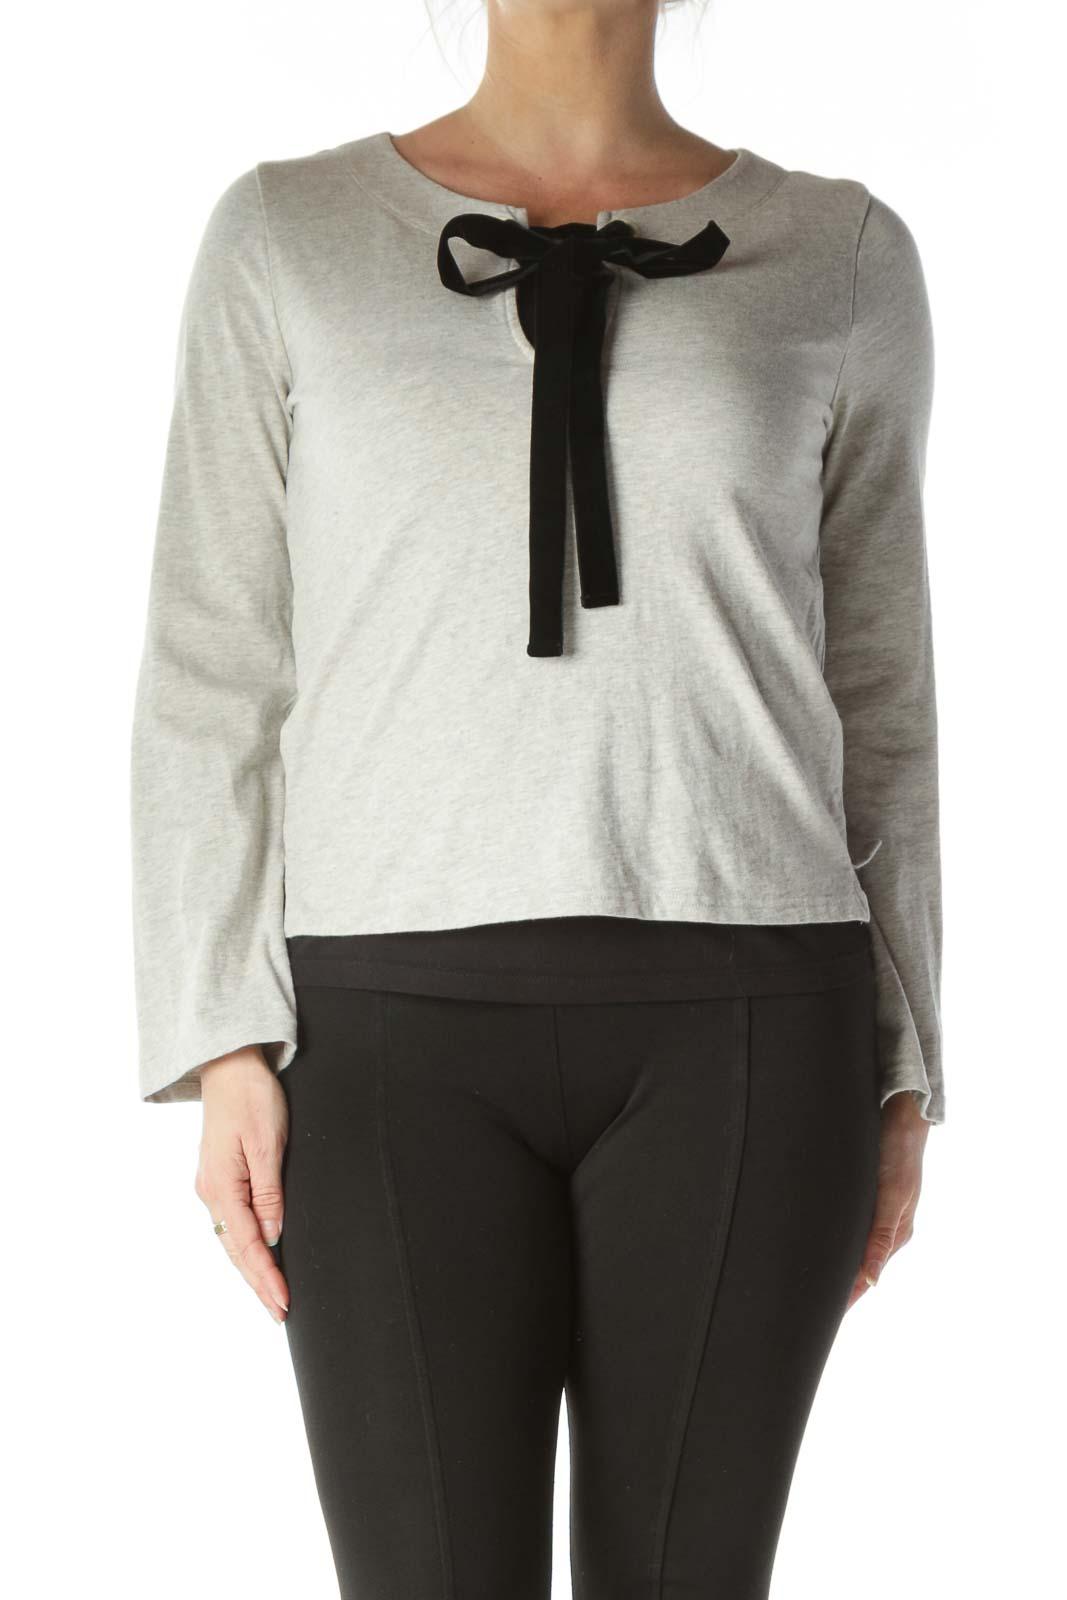 Gray Fleece with Velvet Tie